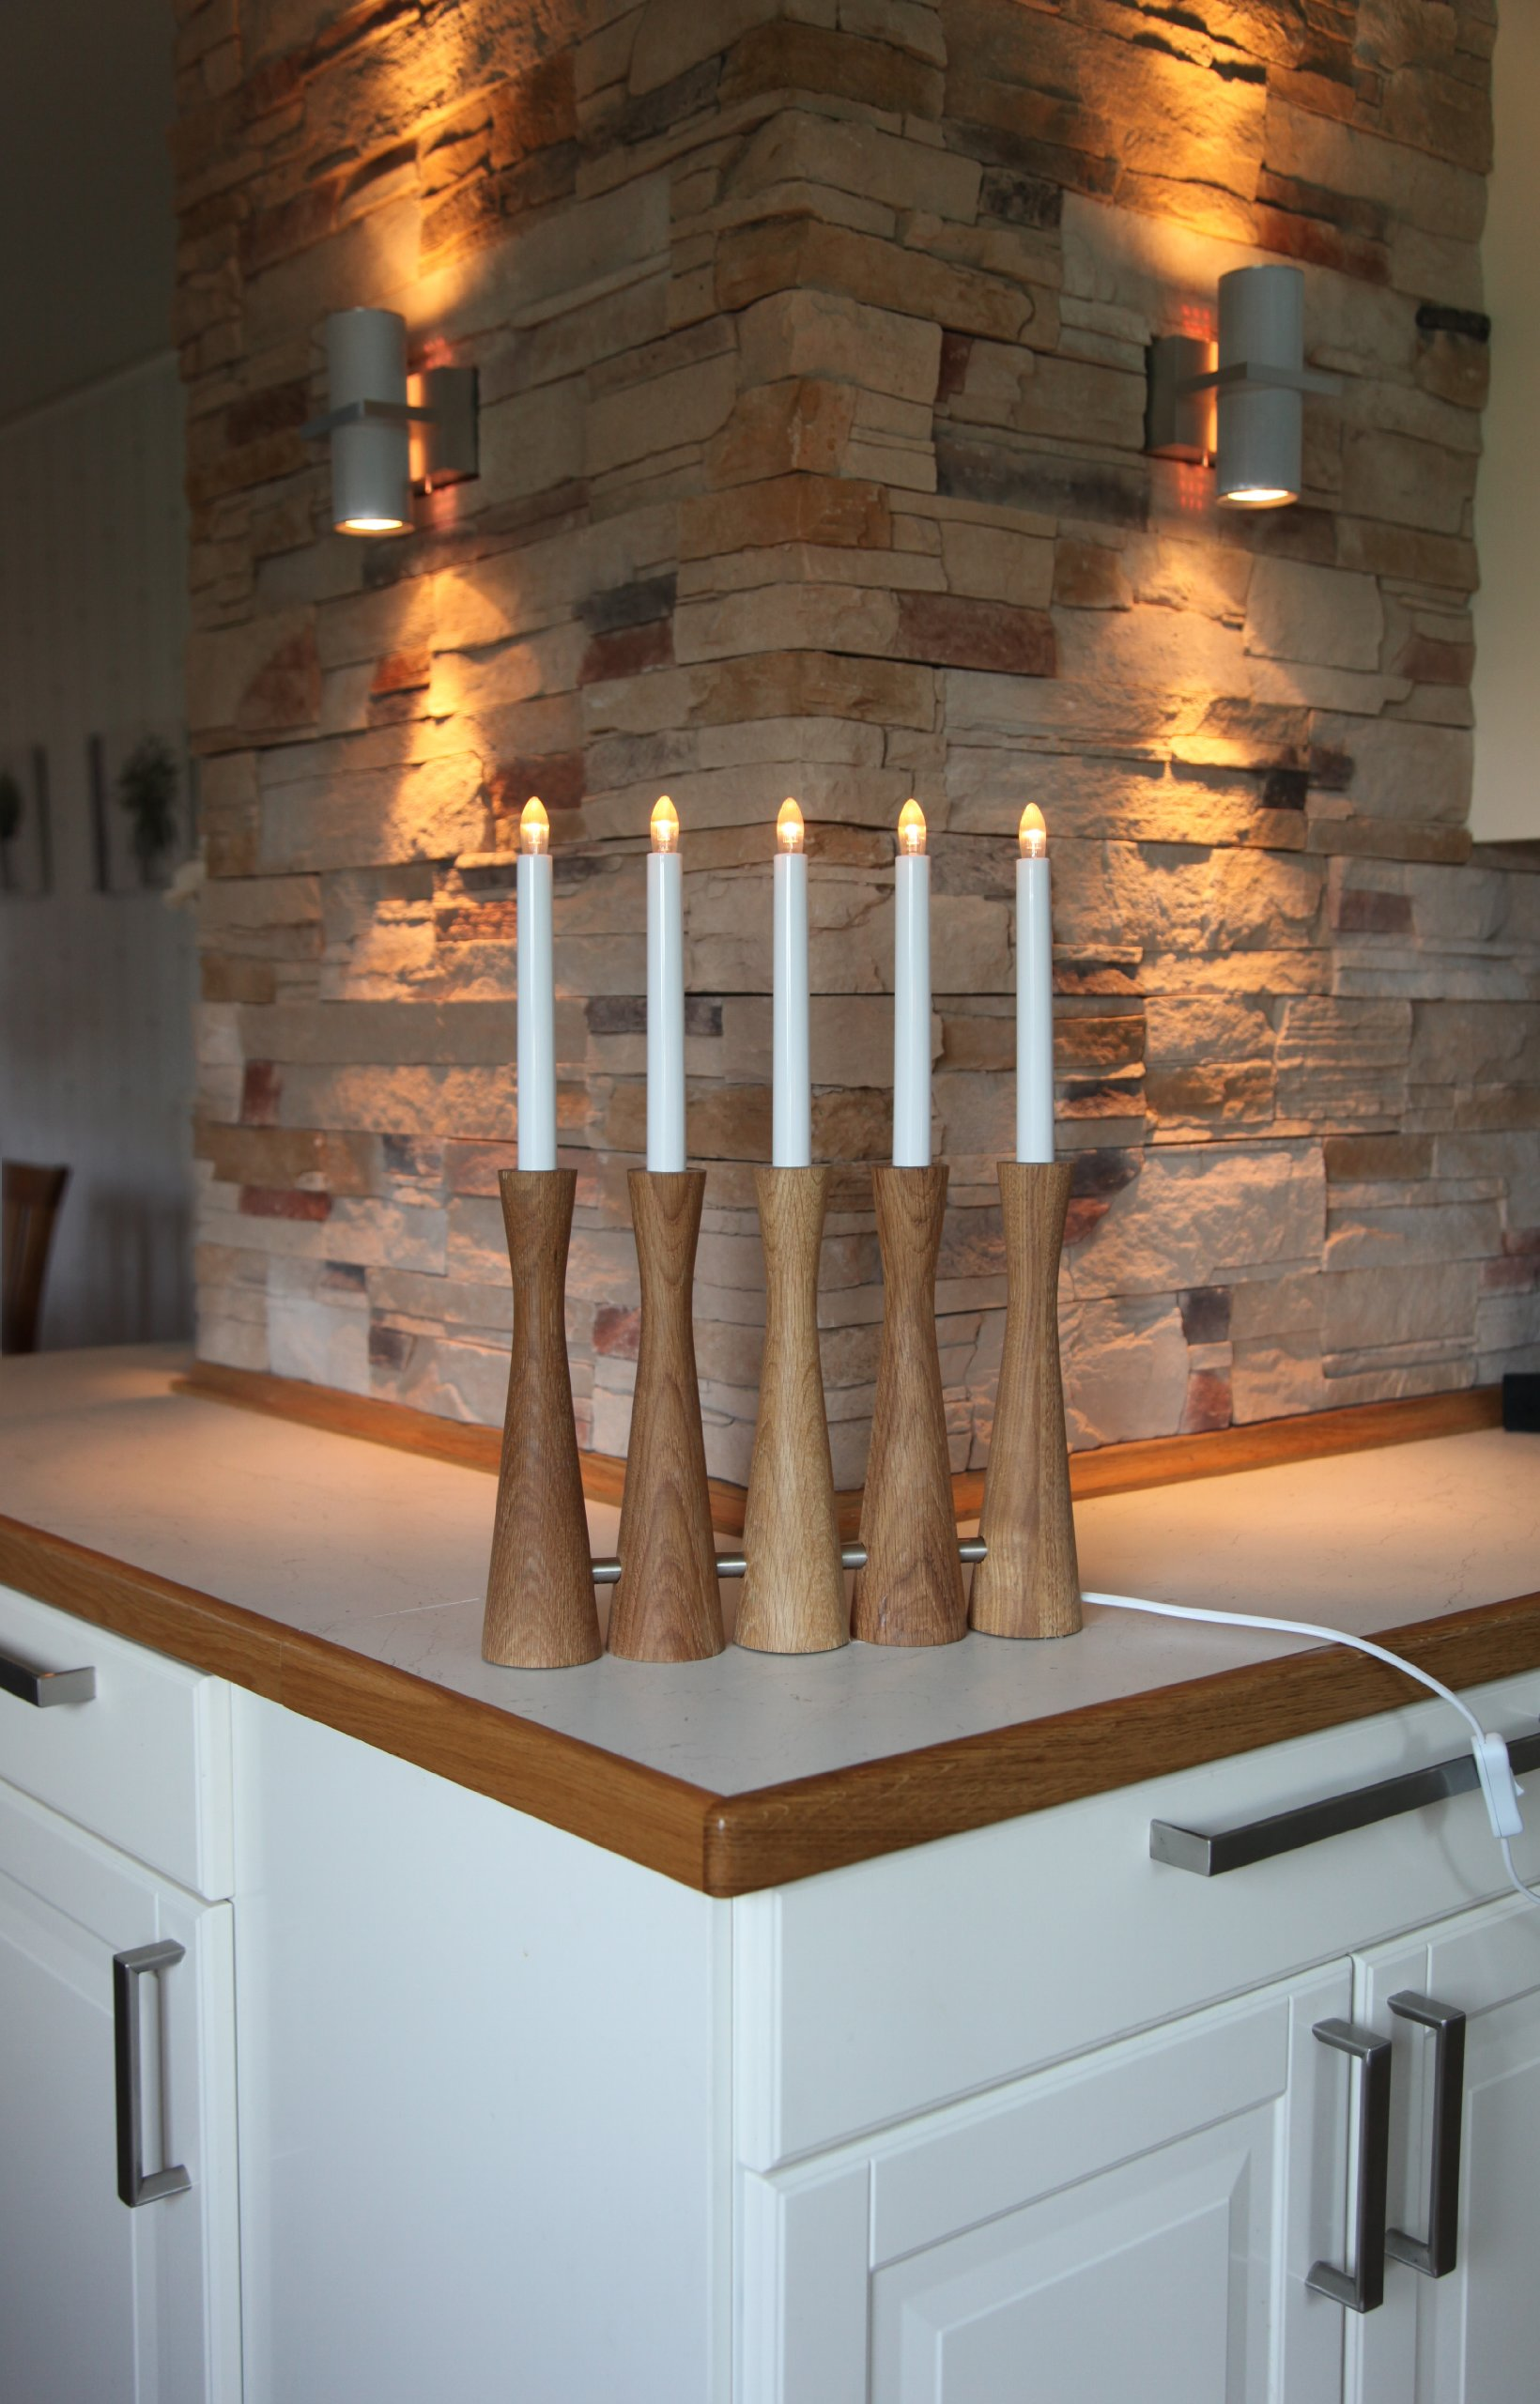 Best-Season-LED-FensterleuchterMidja-5-flammig-Material-HolzMetall-Hhe-circa-42-cm-Vierfarb-Karton-natur-195-16